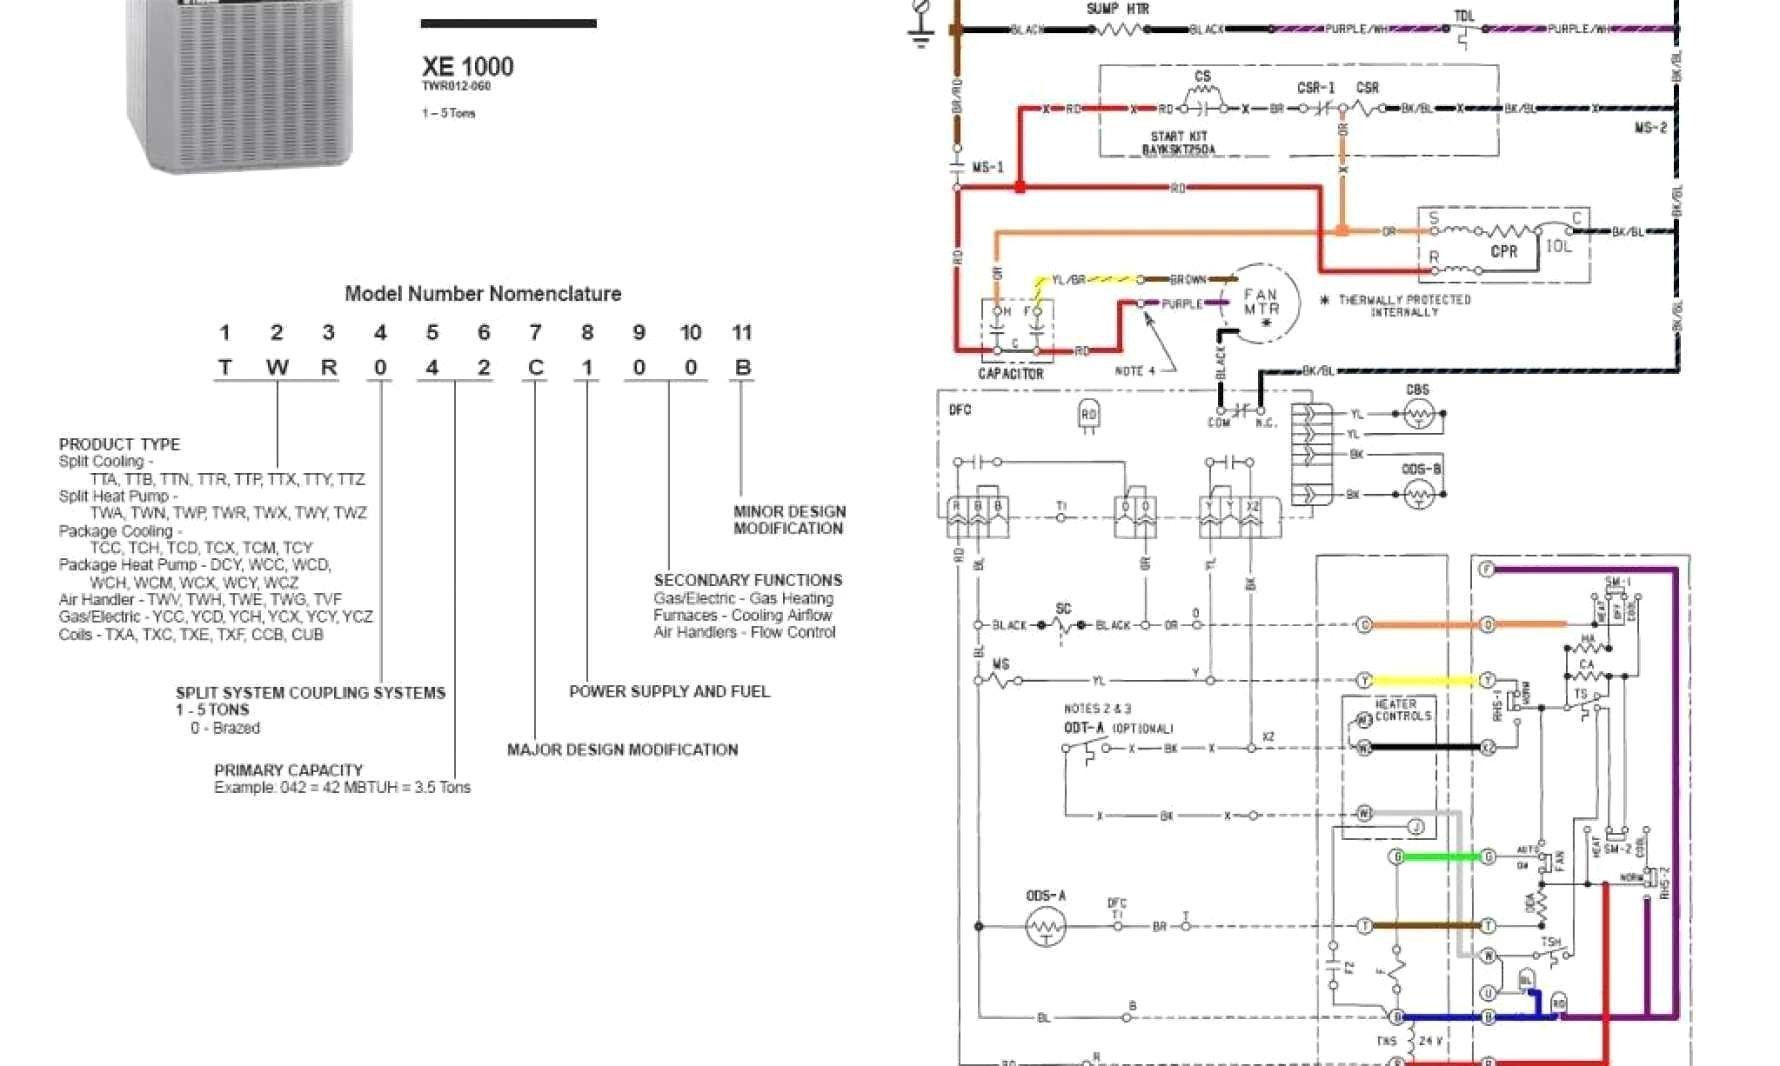 Astonishing Trane Thermostat Wiring Diagram Luxury Wiring Diagram For Trane With Wiring Cloud Hisonepsysticxongrecoveryedborg